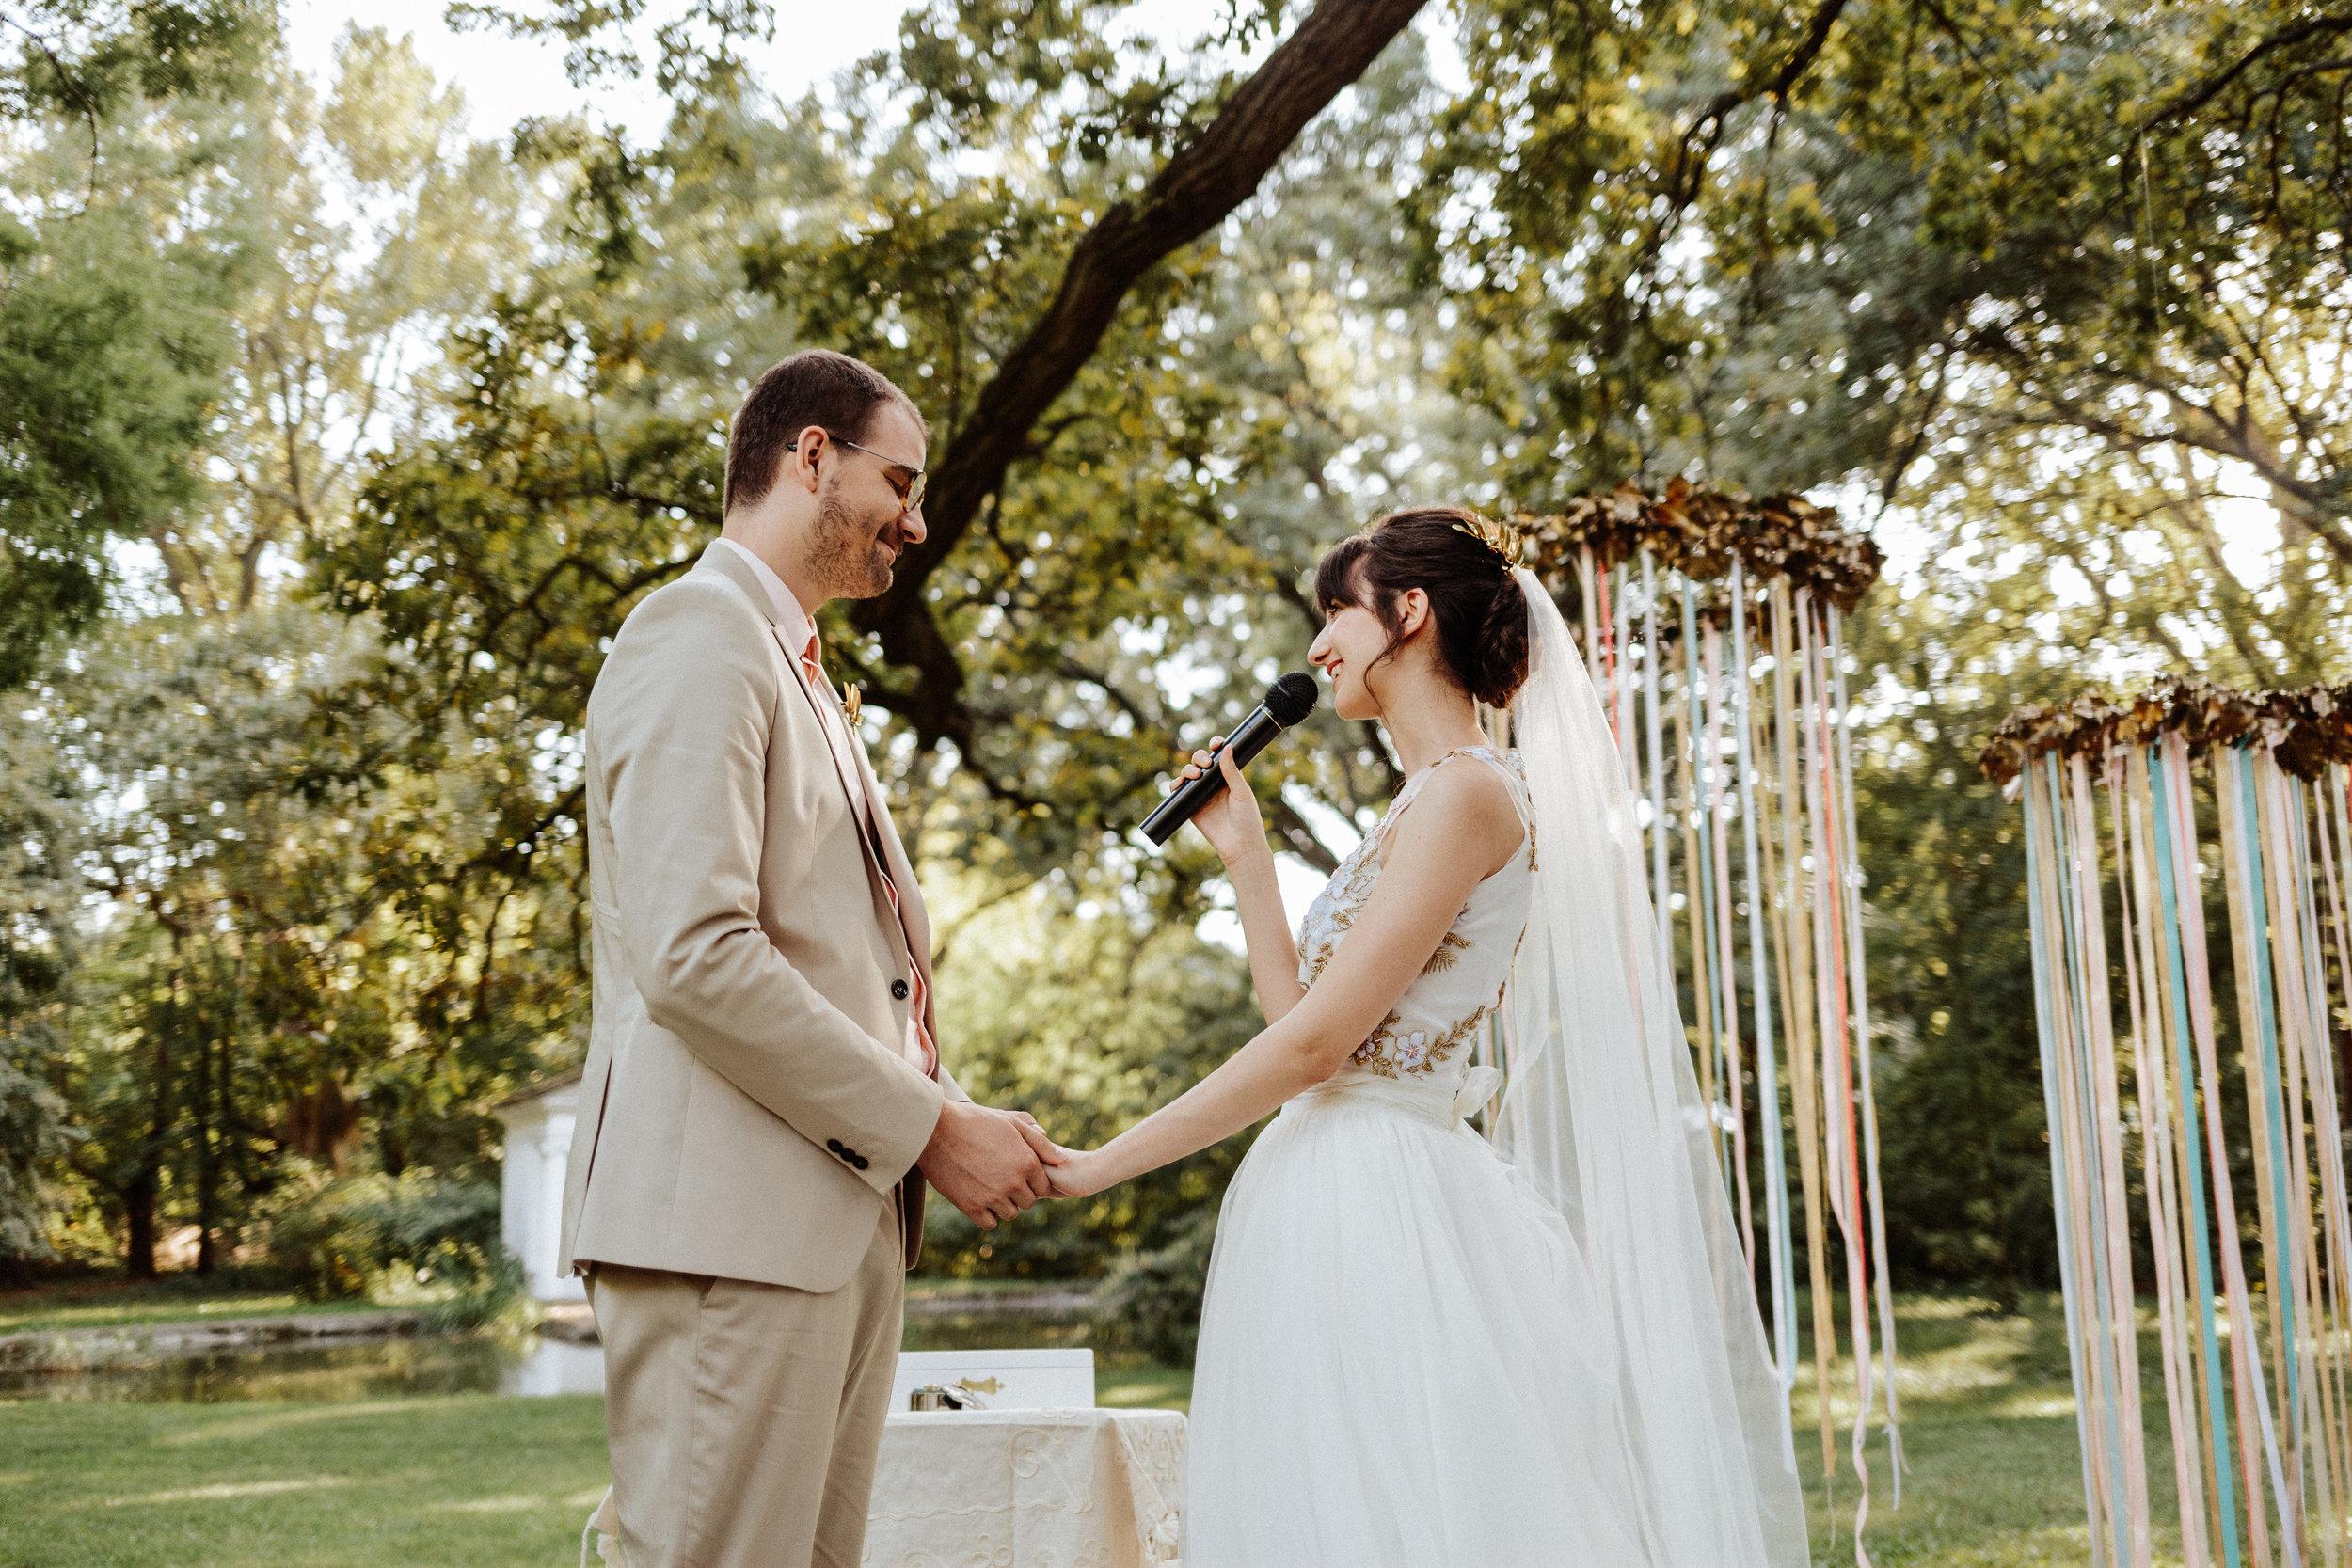 20170826_Rebi+Dani_wedding_f_259__MG_3800.jpg